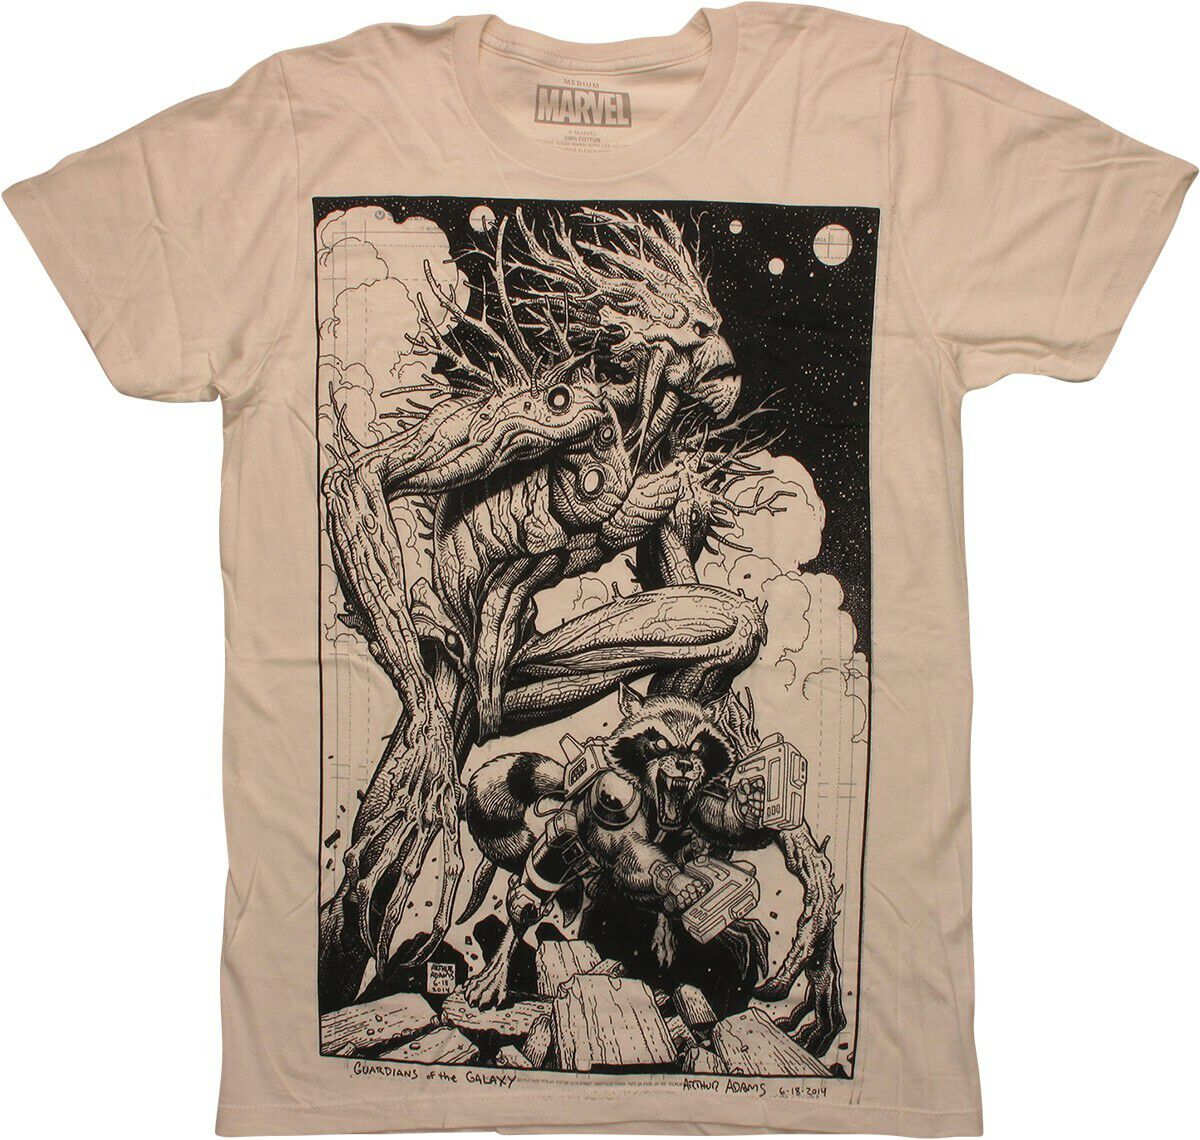 Guardians of the Galaxy Groot Rocket Adams T-Shirt